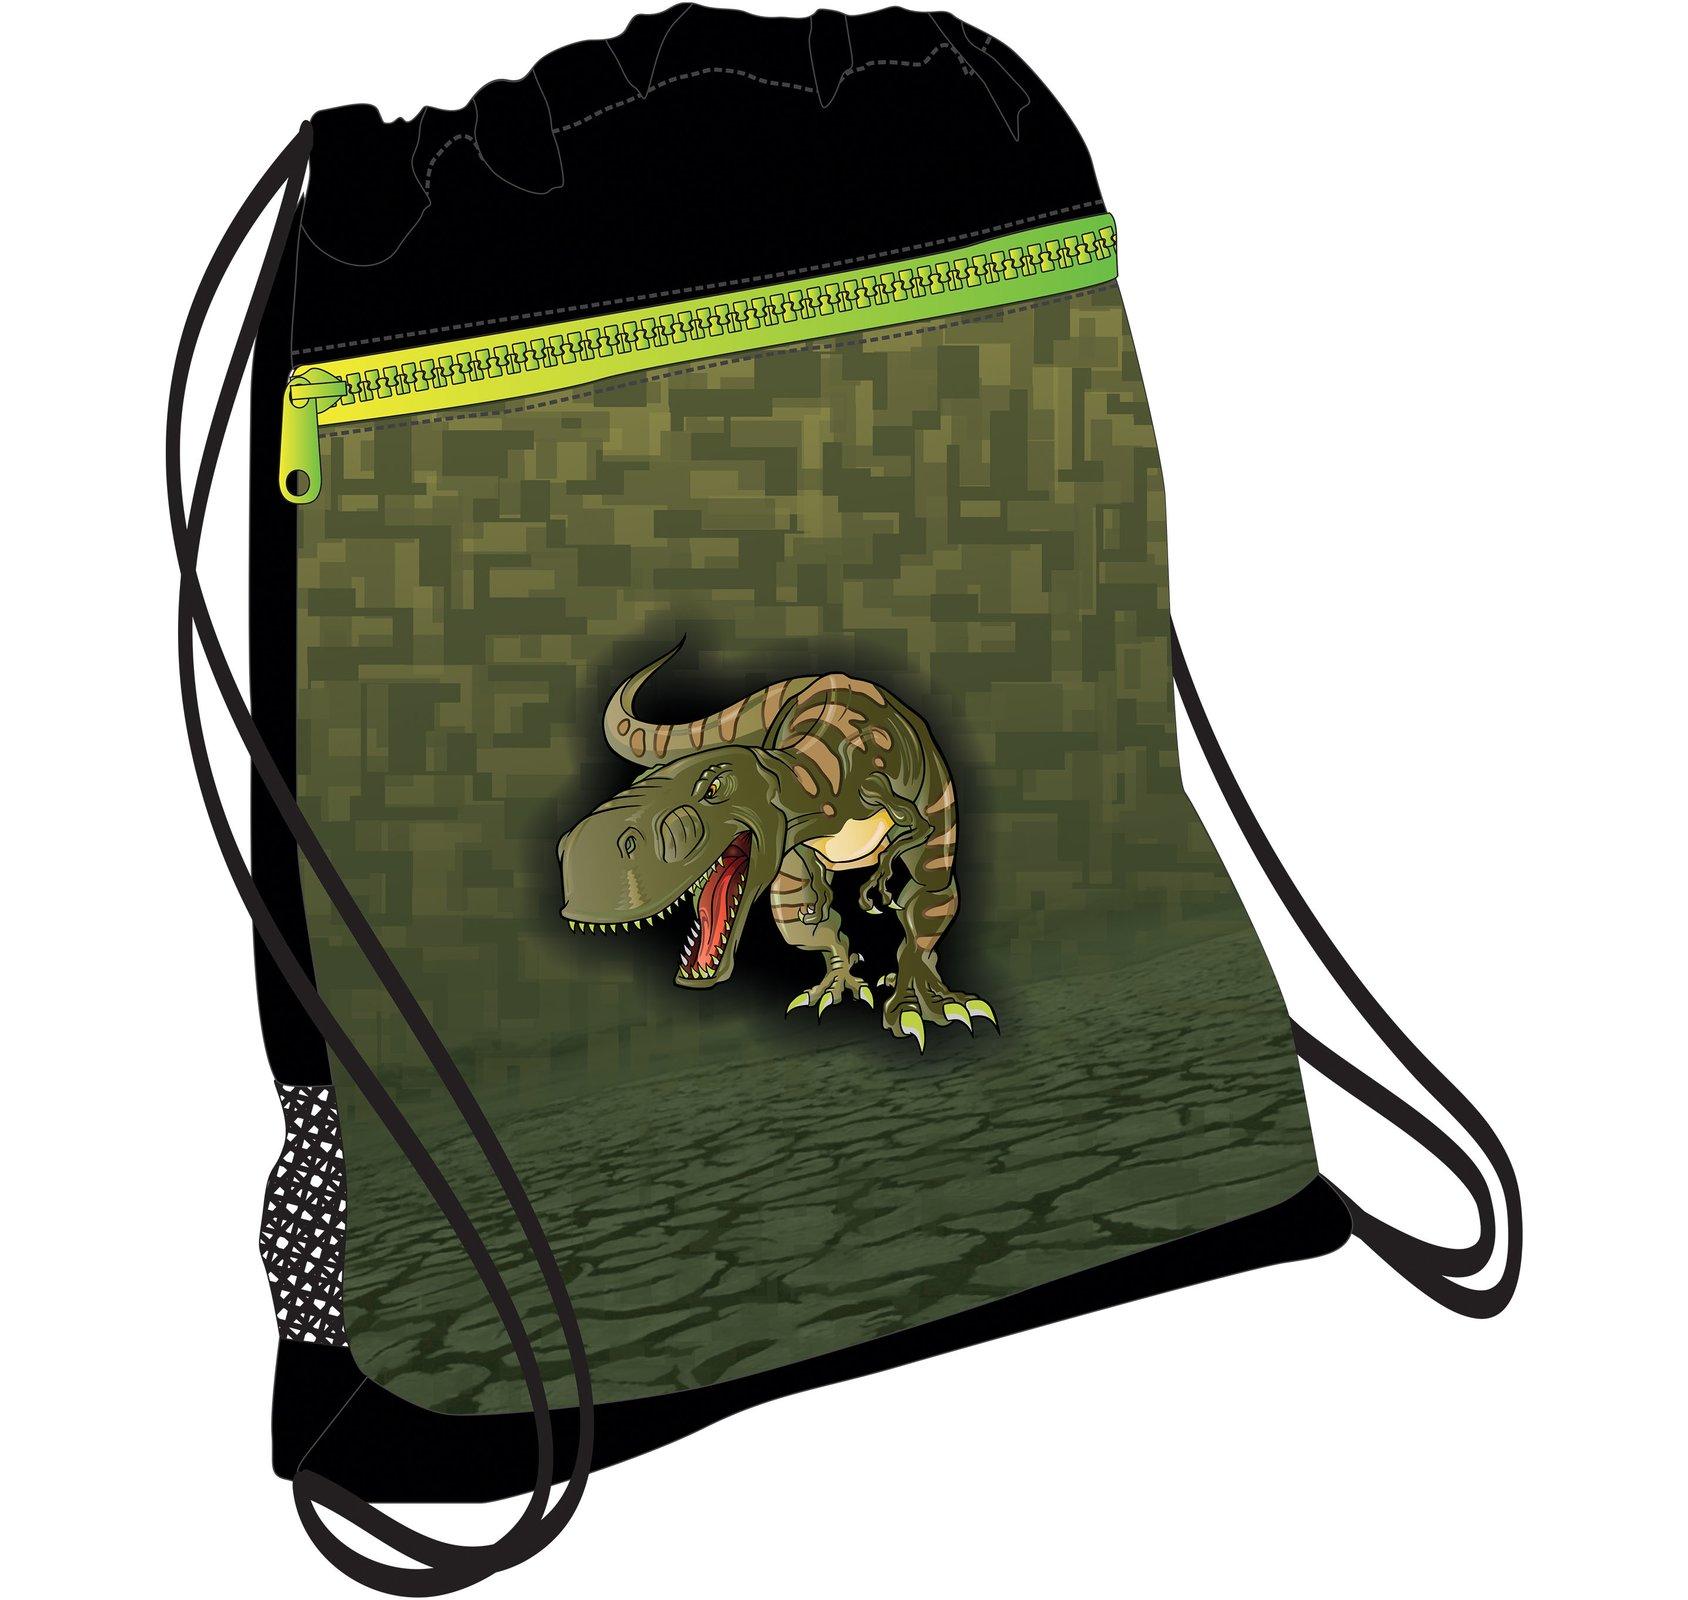 Ранец Belmil Дино 404 5 Dino Discovery + мешок, - фото 6